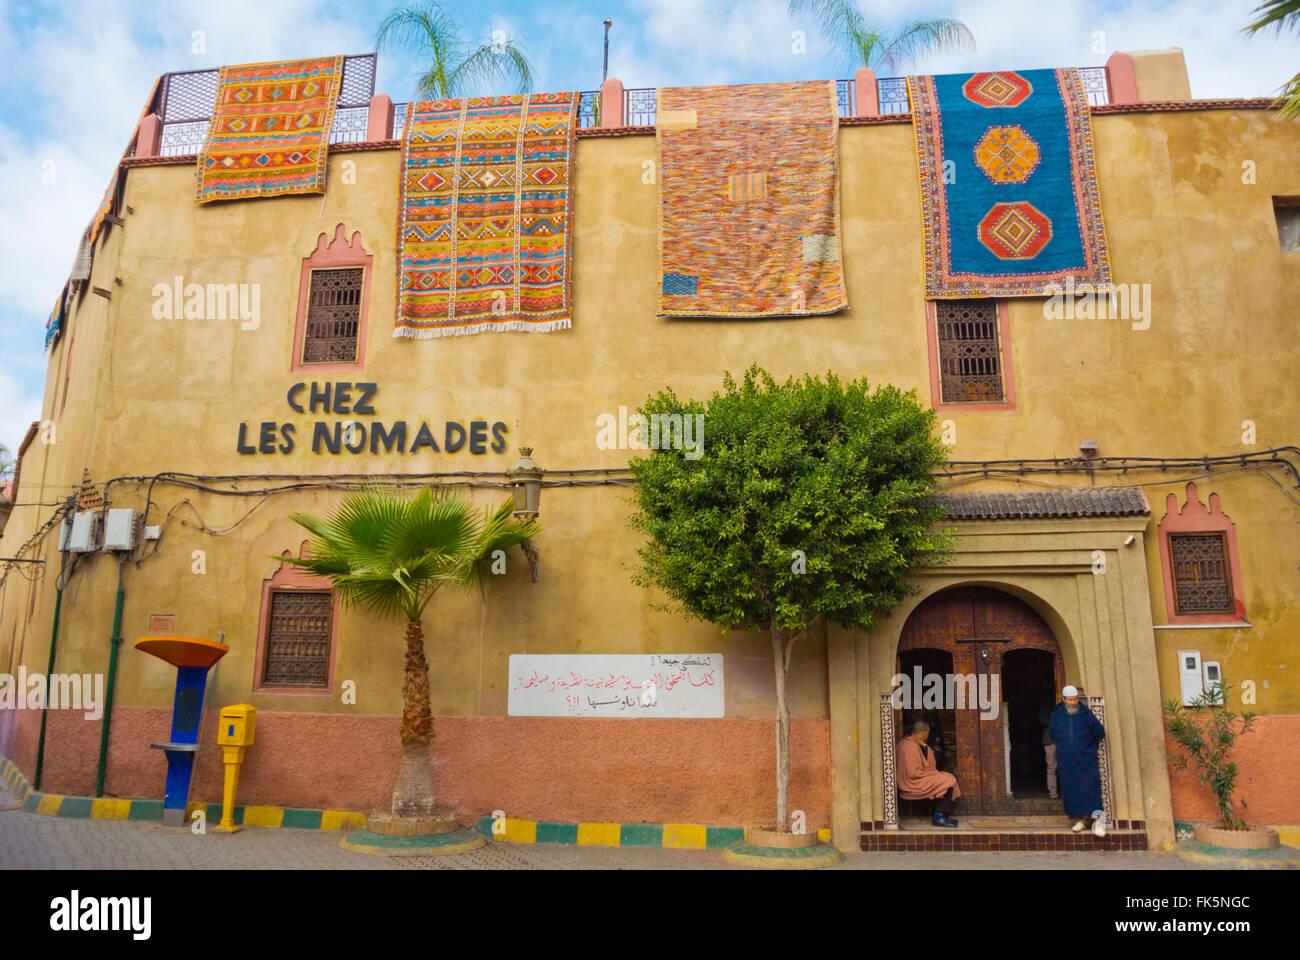 Chez les Nomades, carpet shop, Medina, Marrakesh, Morocco, northern Africa - Stock Image